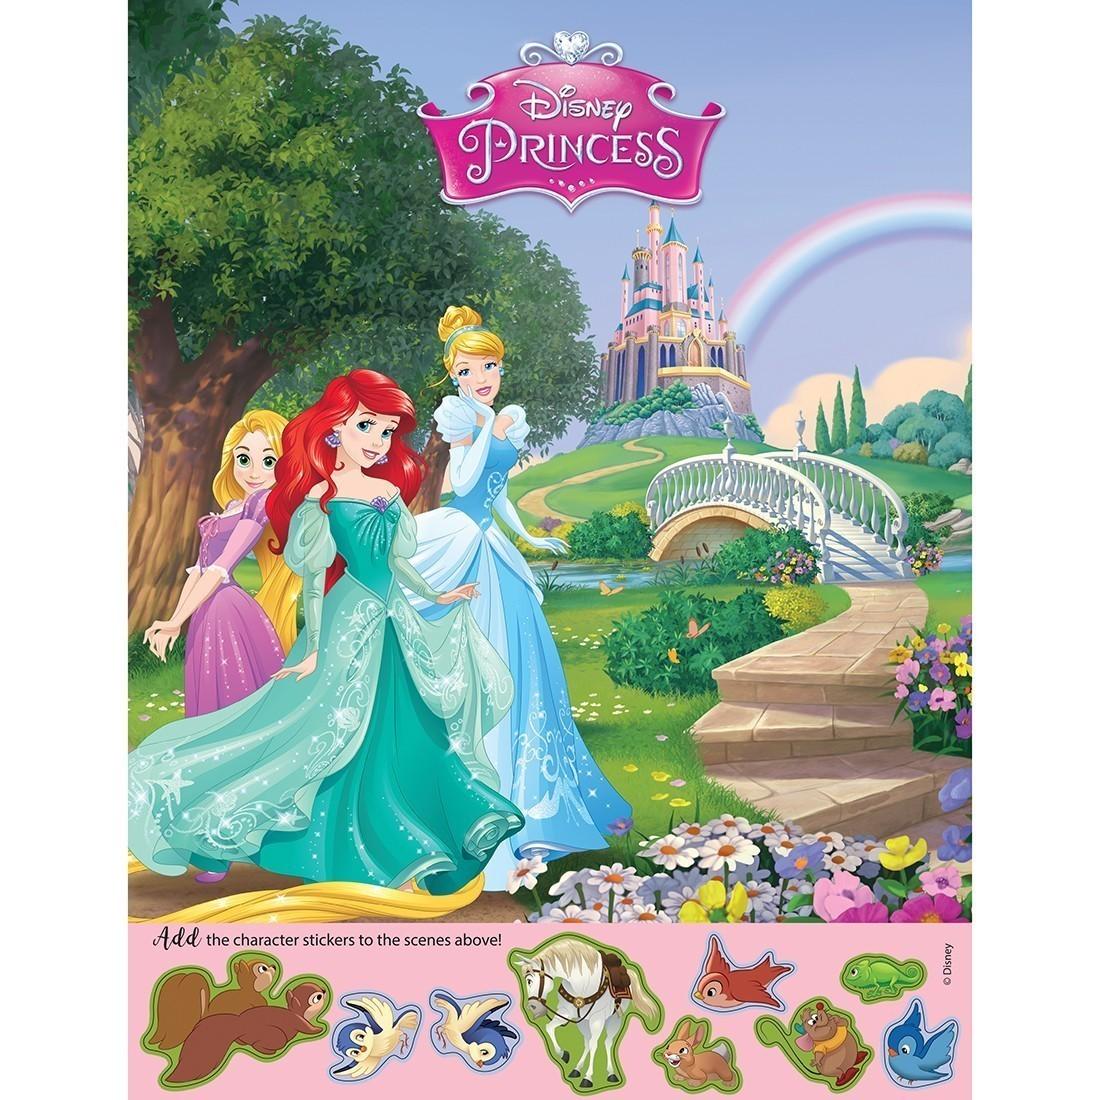 Disney Princess Sticker Activity Sheets [image]